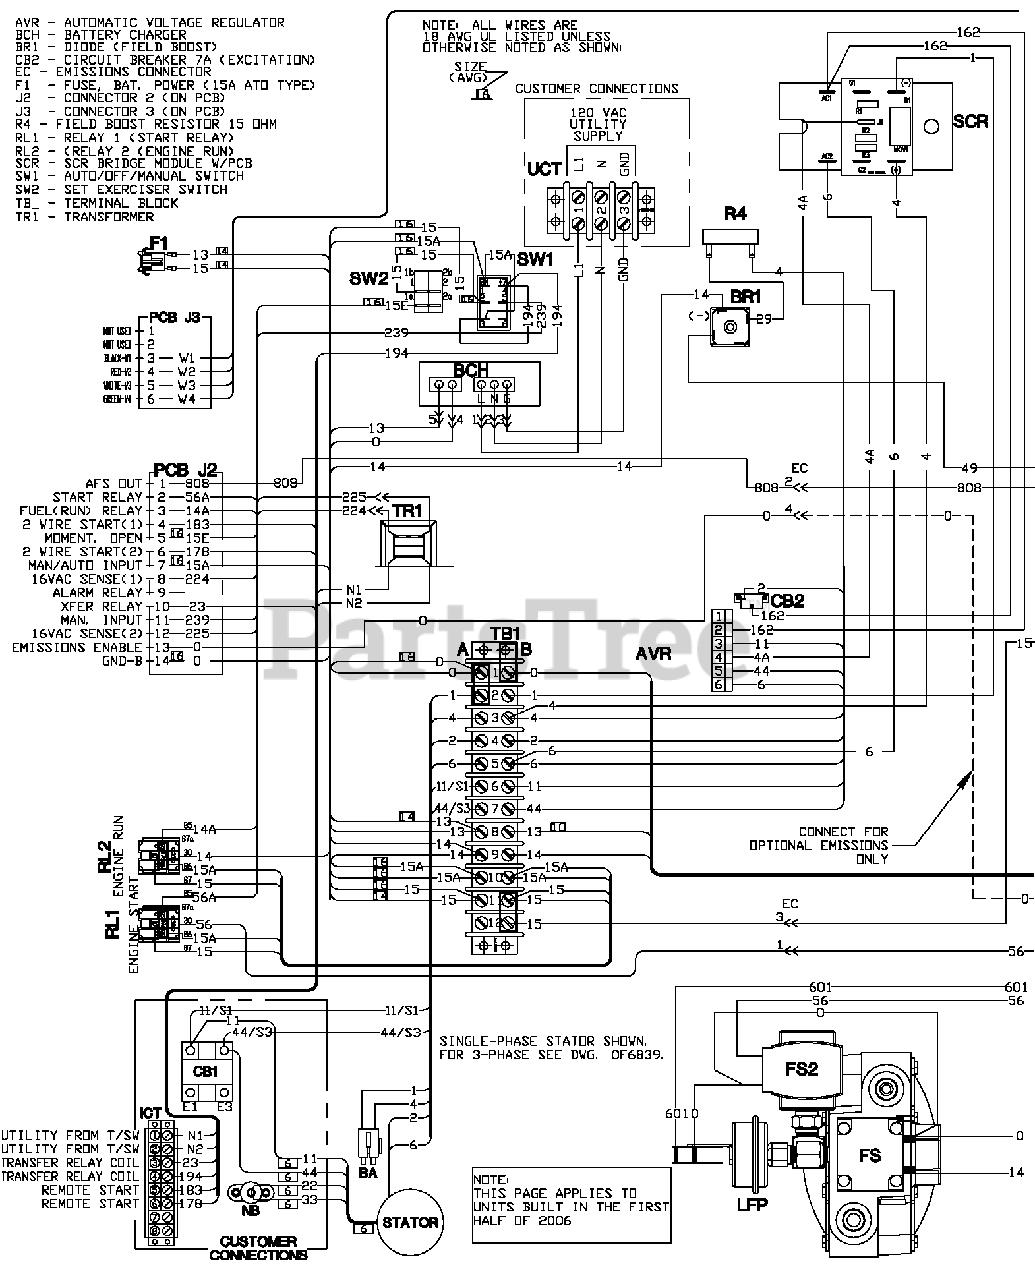 Wiring Diagram For Gsd F00ww